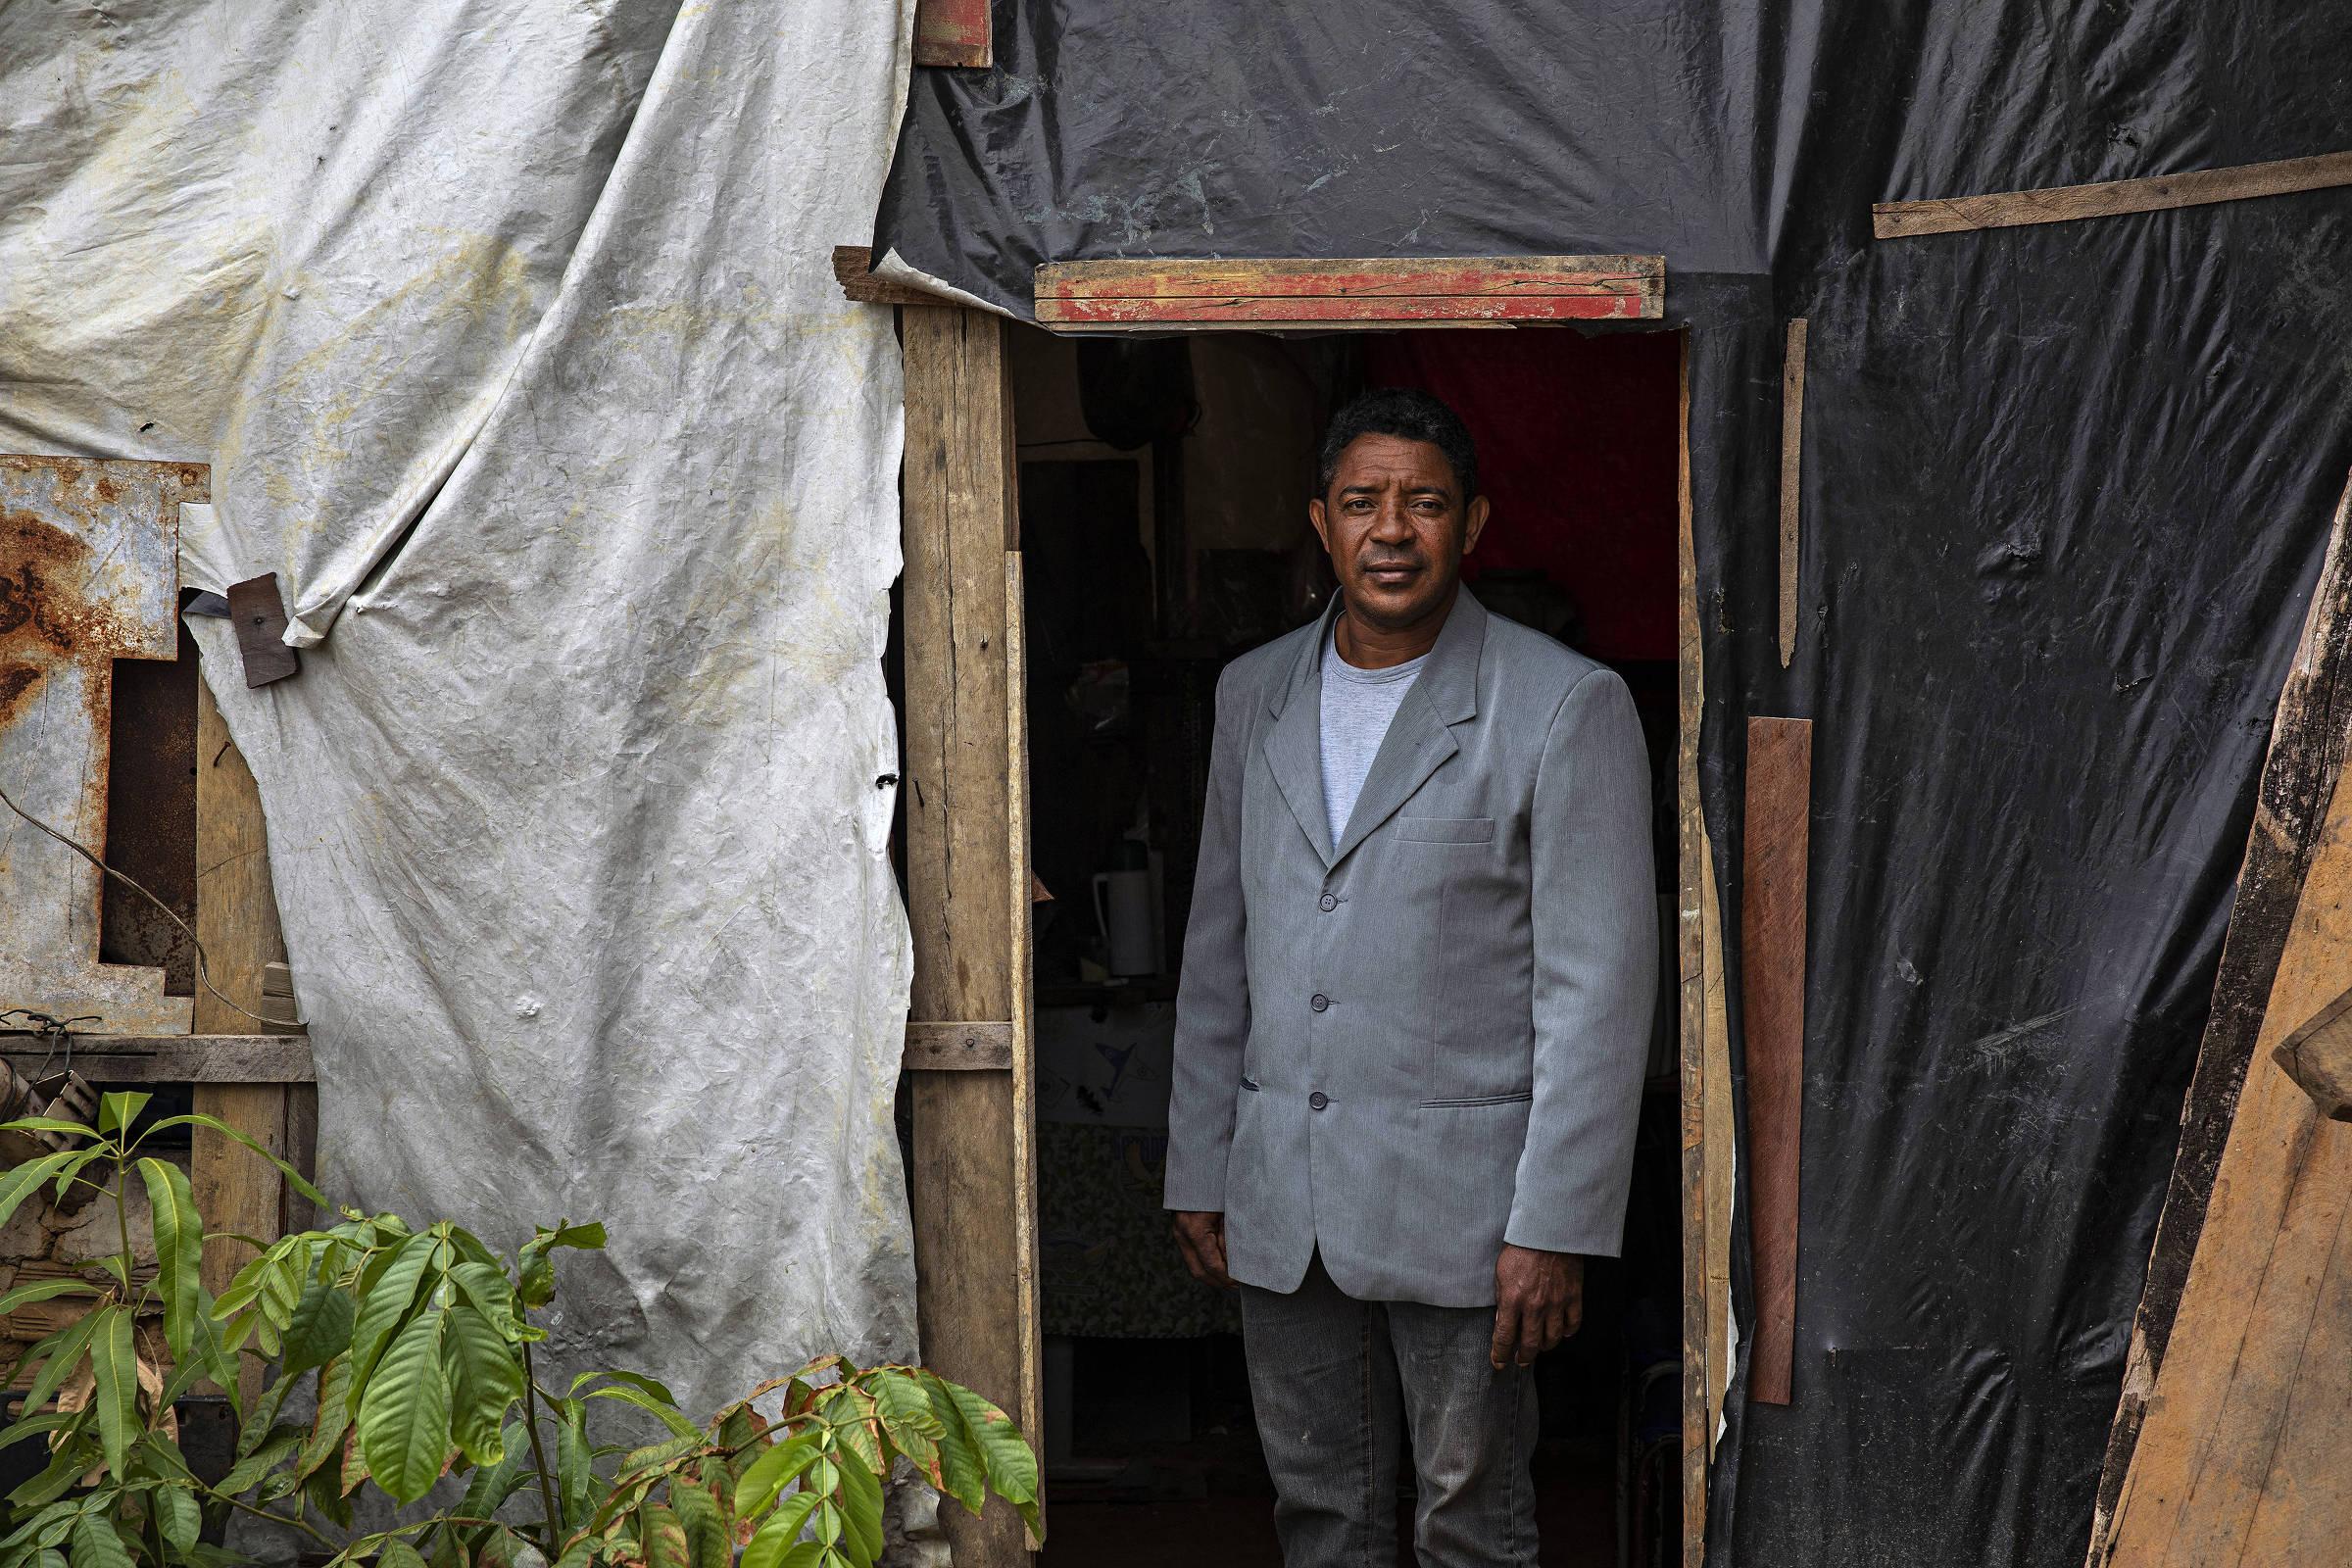 José Roberto de Jesus, 47, porta-voz do acampamento Boa Esperança